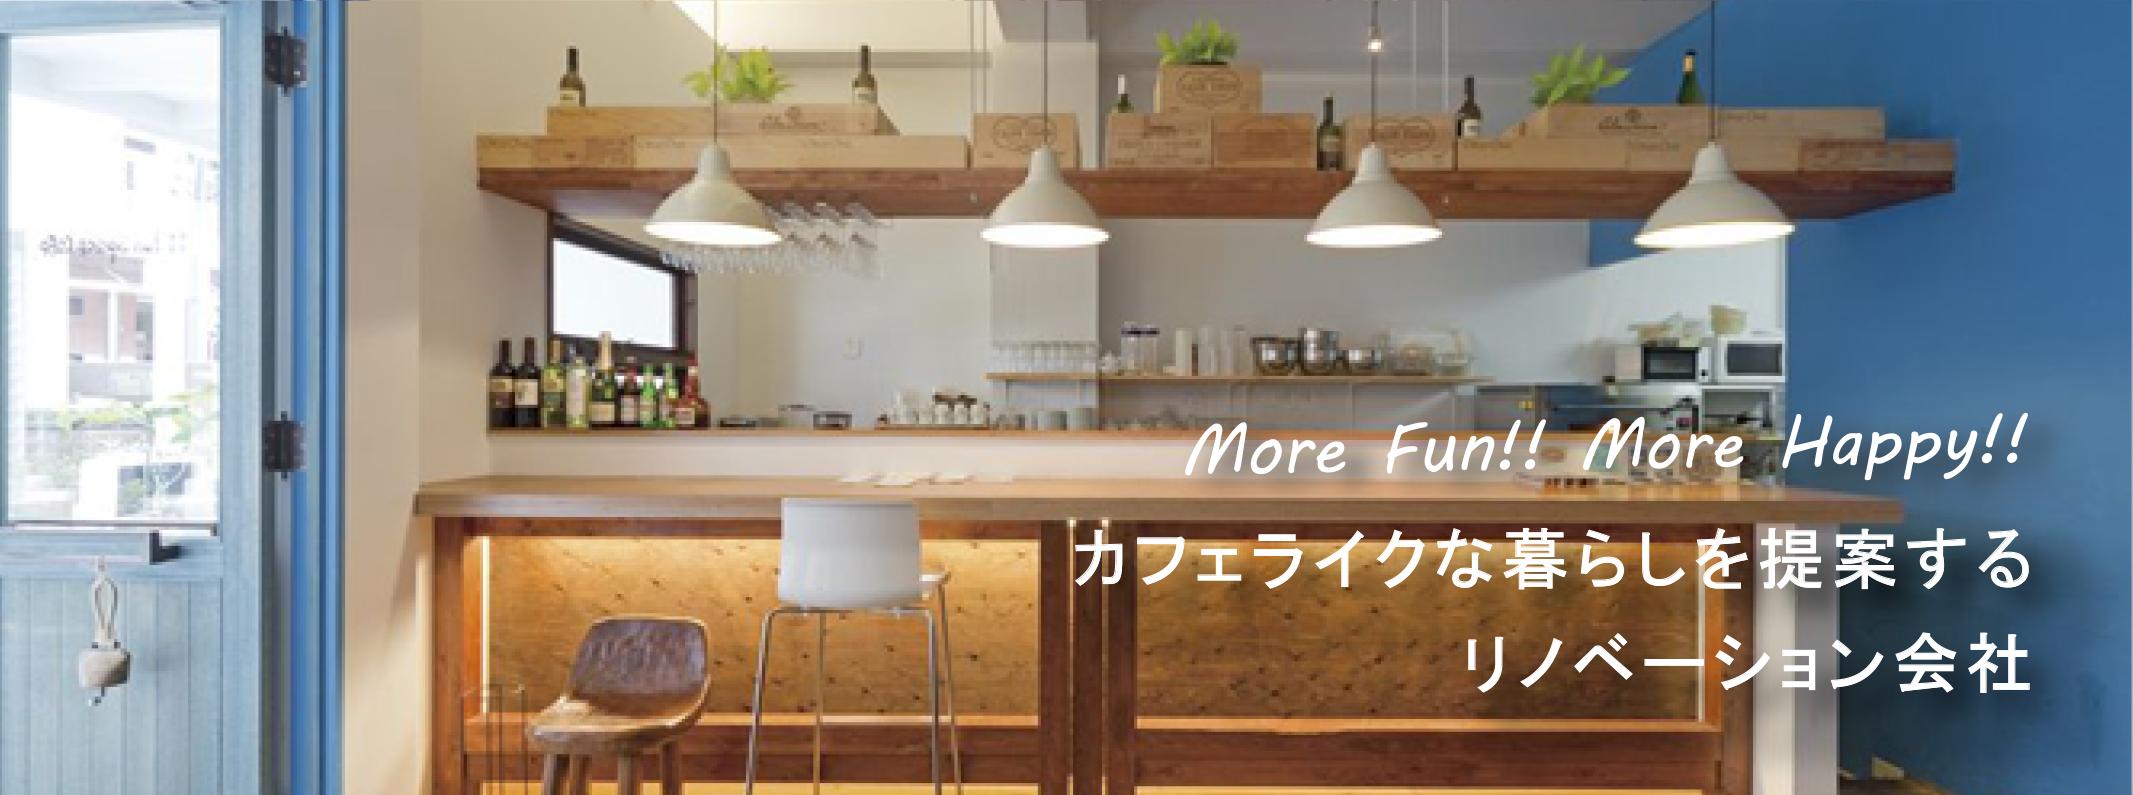 More Fun!! More Happy!! カフェライクな暮らしを提案するリノベーション会社